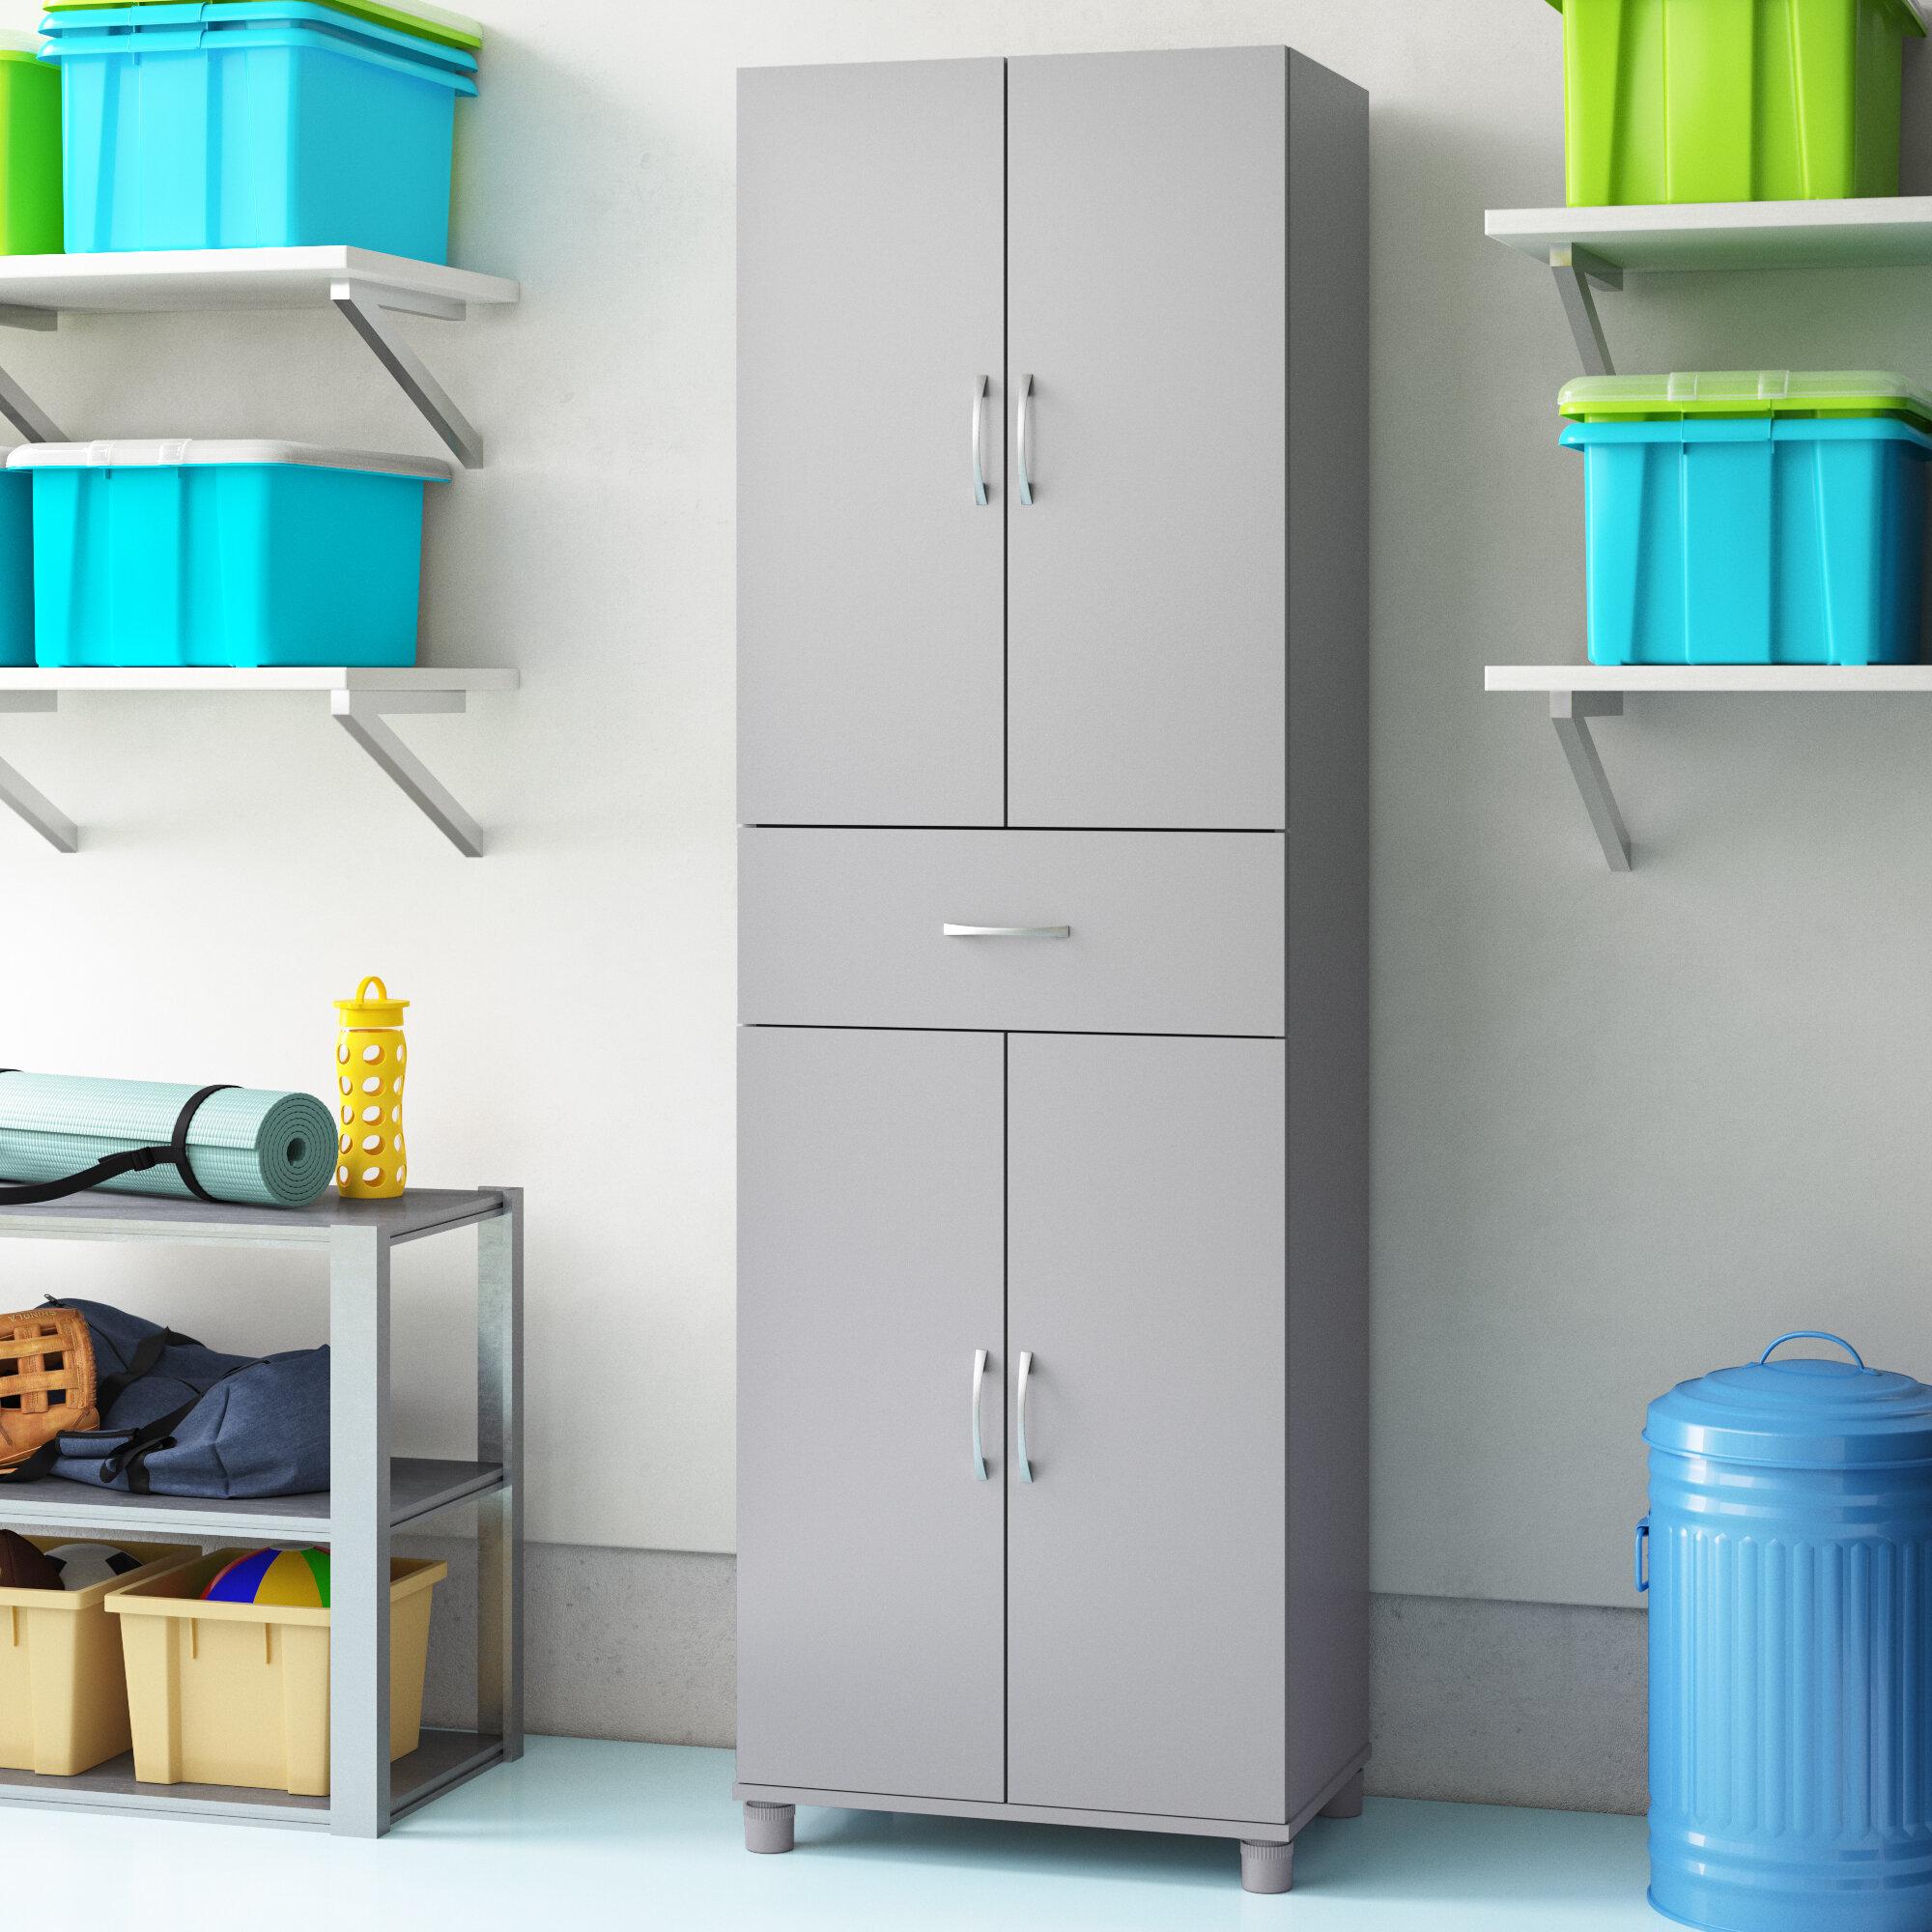 "Wayfair Basics Springboro 6"" H x 6"" W x 6"" D Storage Cabinet"